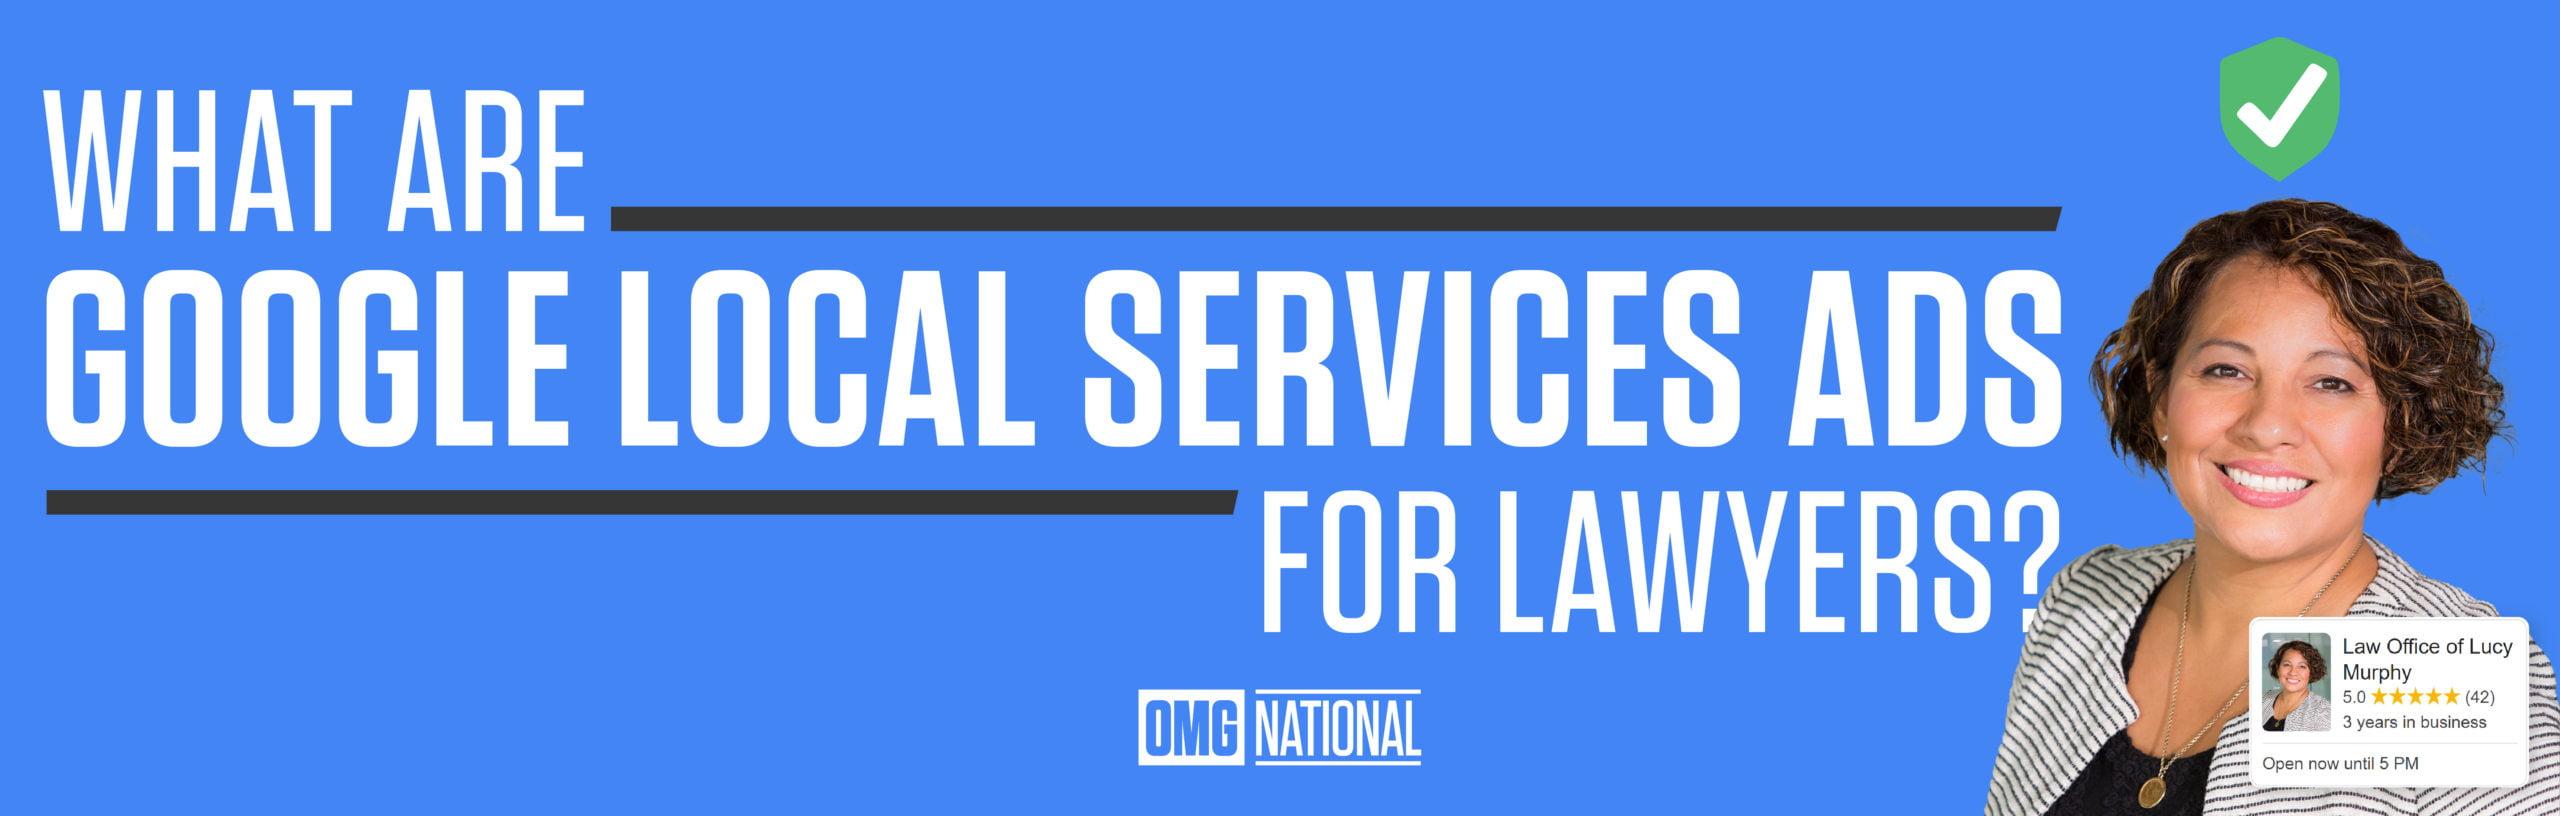 Revised Header 5 14 May Lsa Lawyers Blog 01